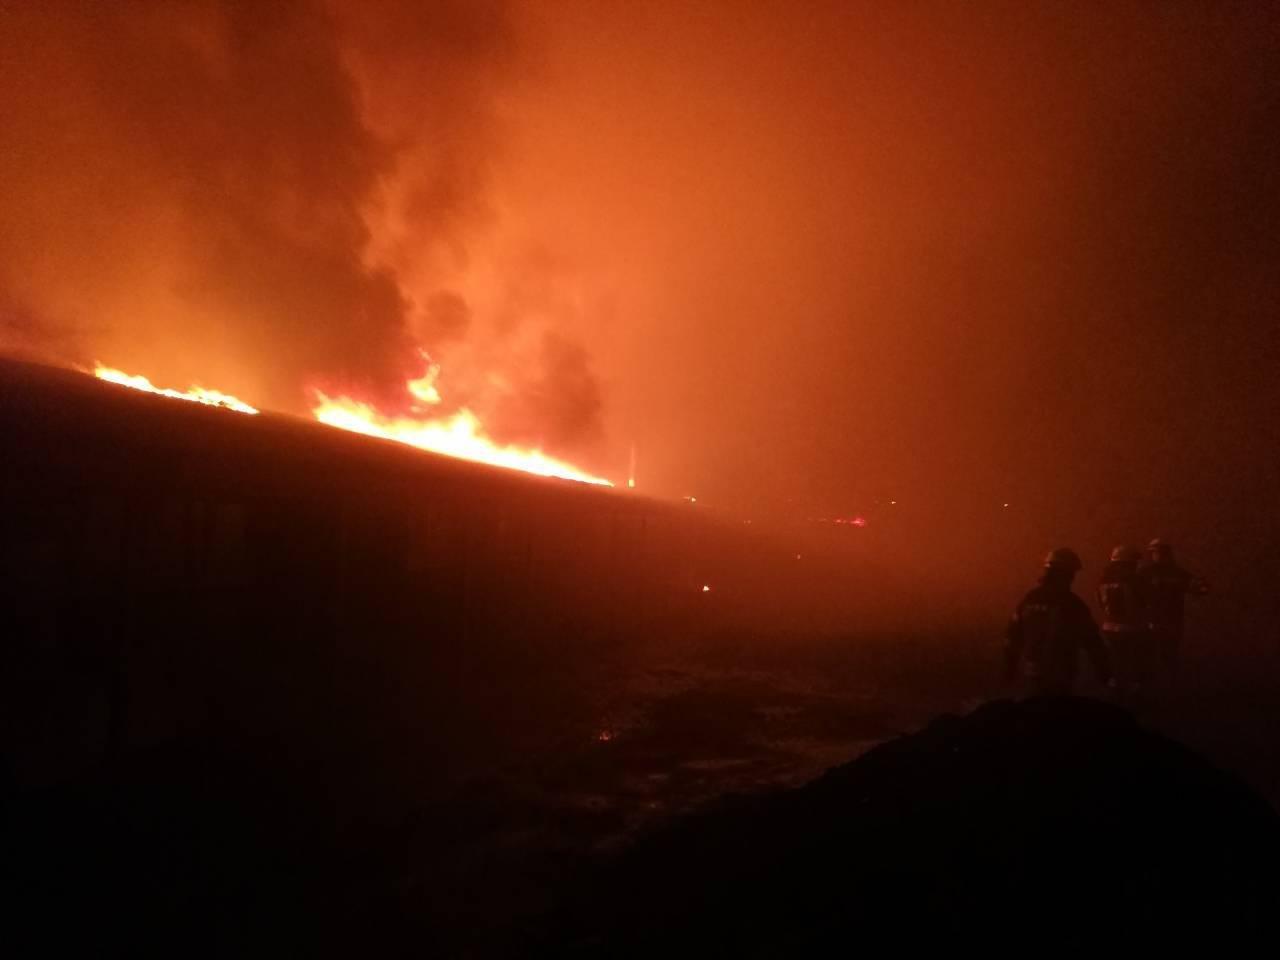 На Киевщине сгорел цех по производству биотоплива (ФОТО), фото-3